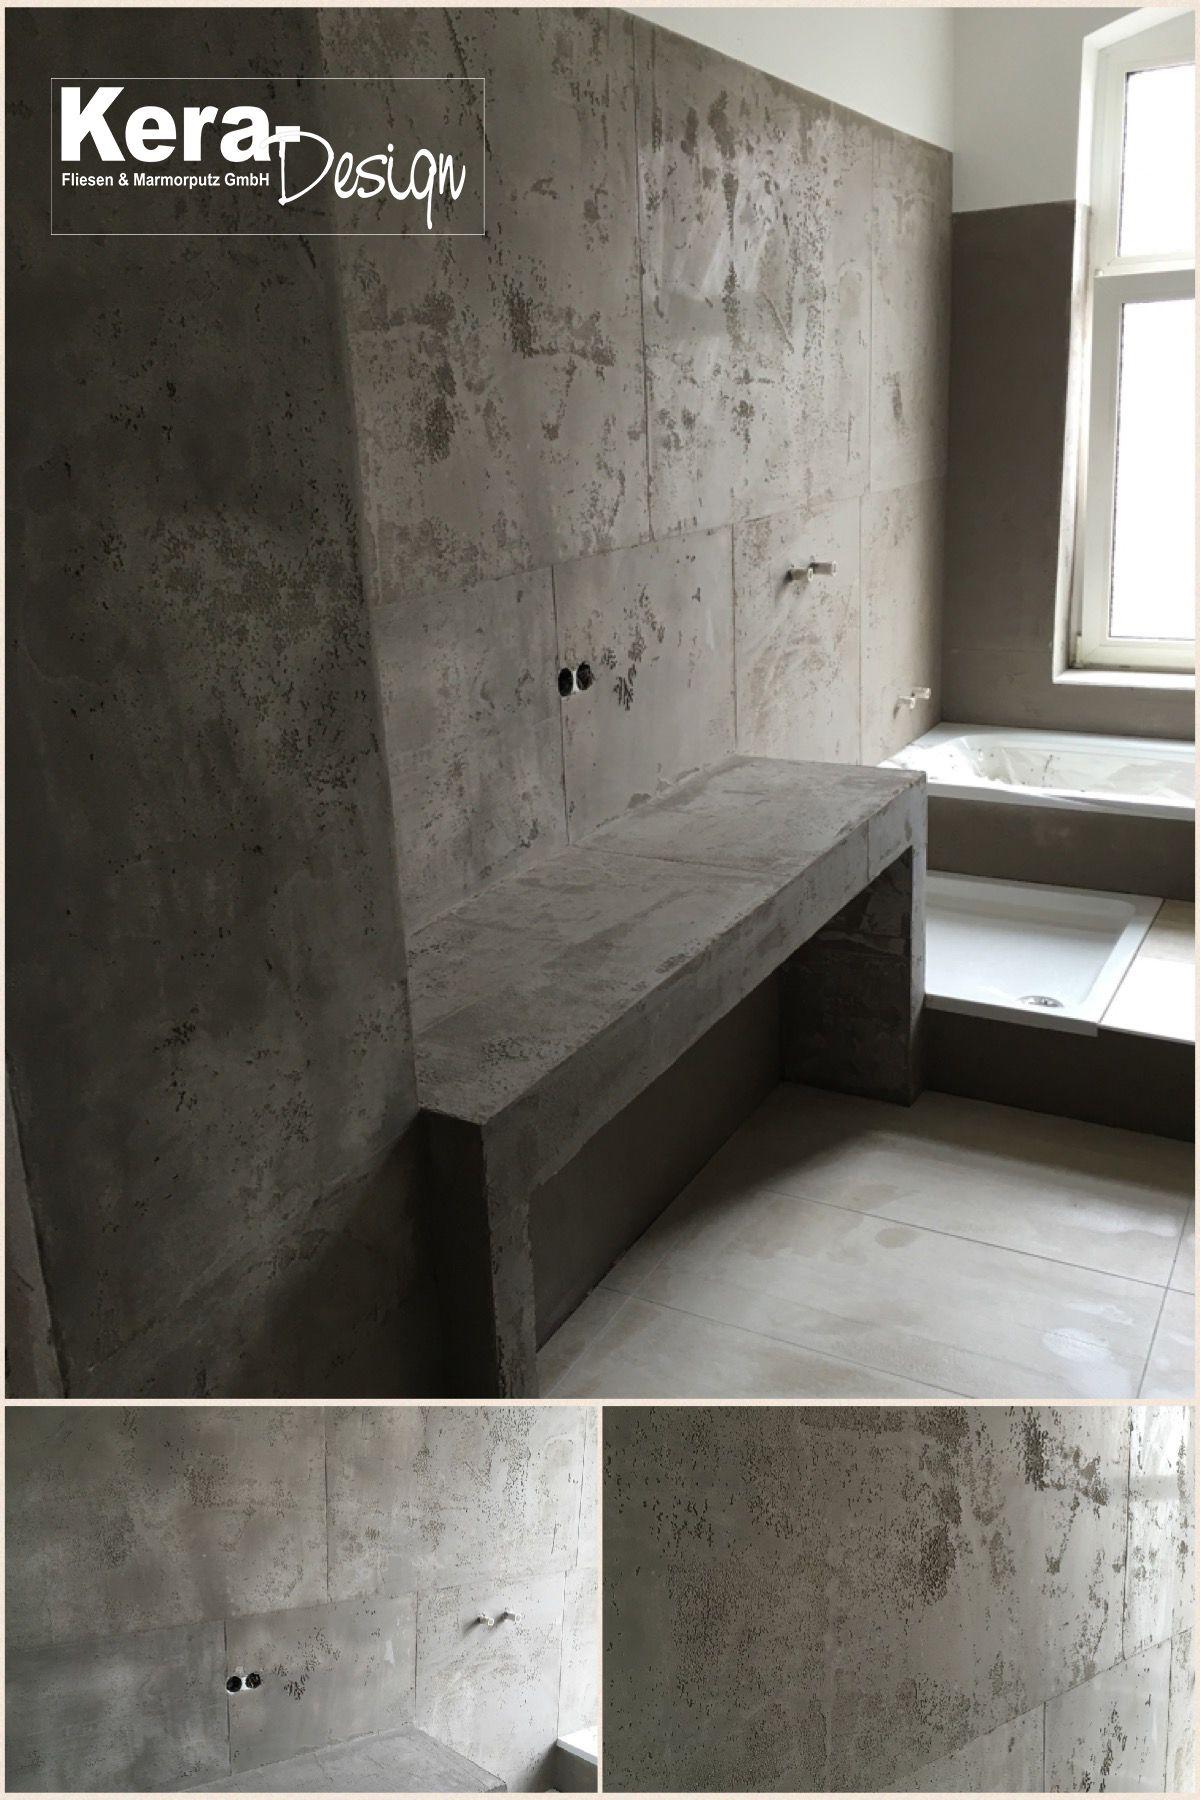 Wandbeschichtung in Betonoptik. #marmorputz #wandbeschichtung #betonoptik #pargahaus #volimea #braunschweig #concrete